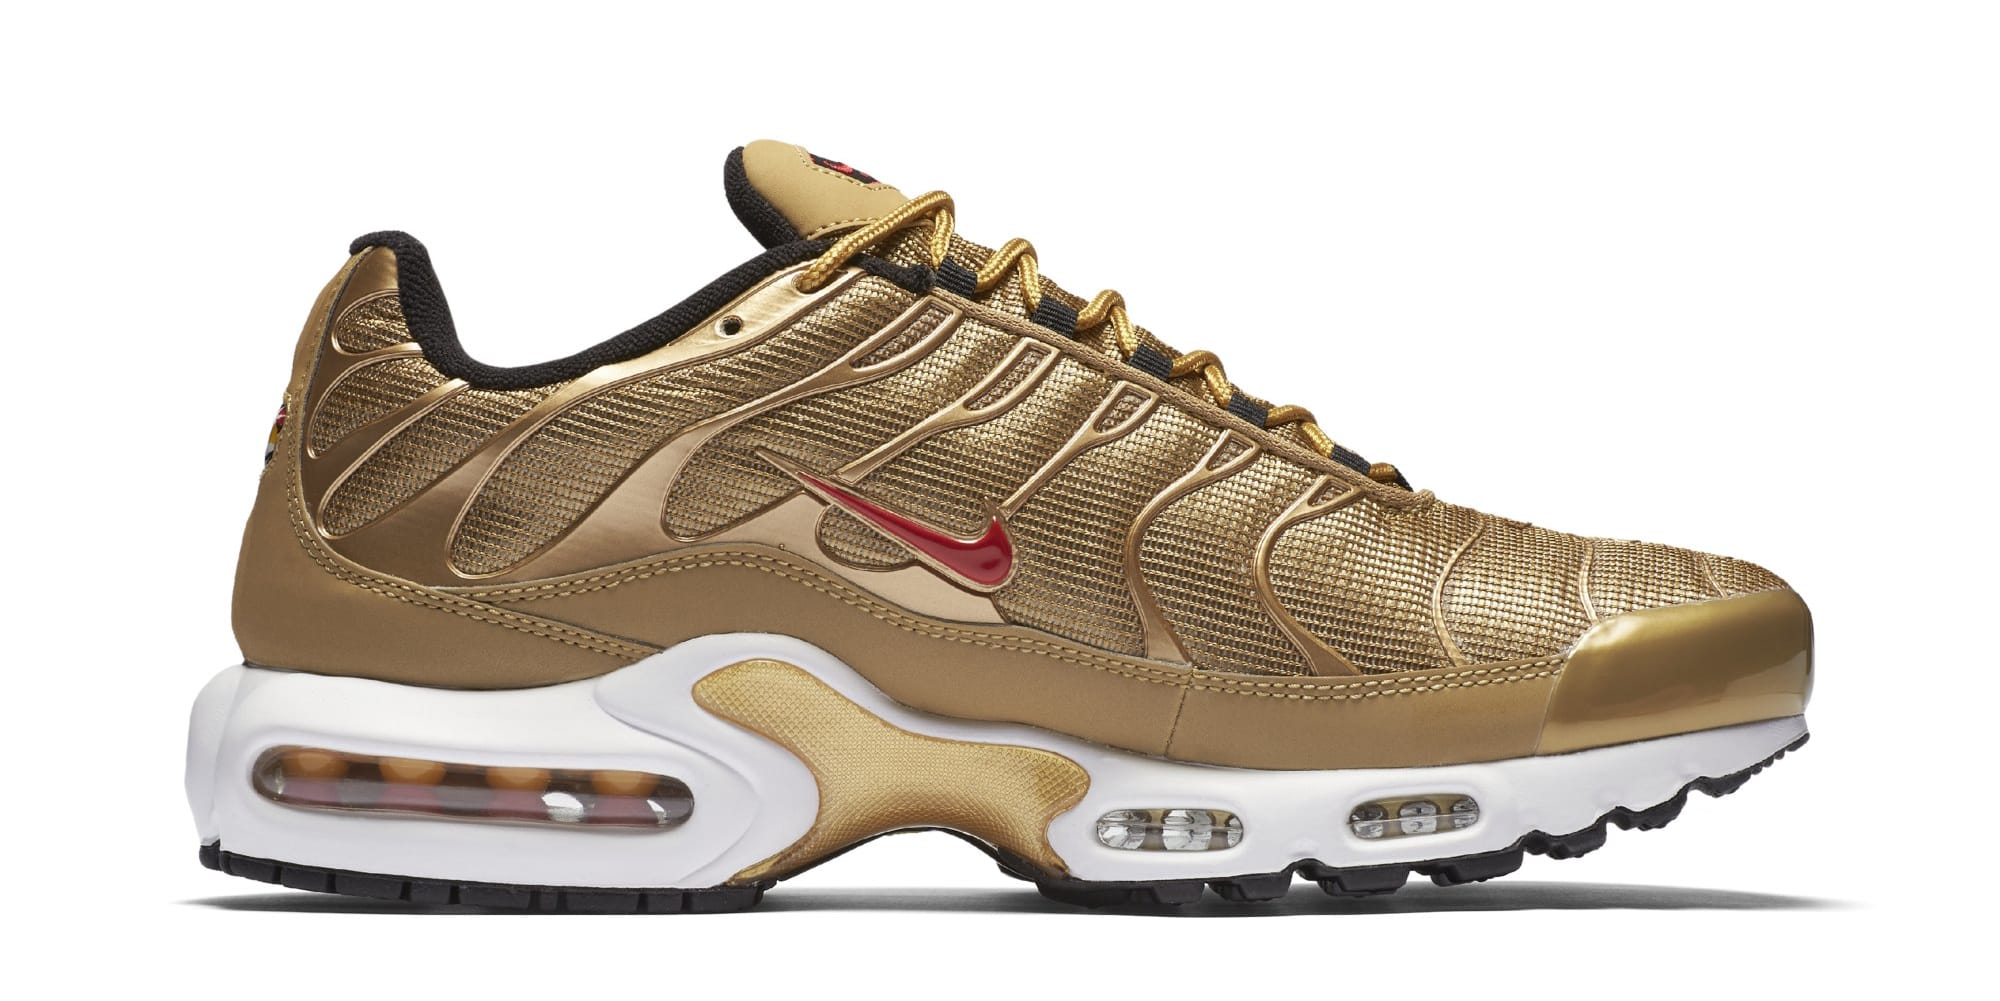 Nike Air Max Plus 'Metallic Gold' 903827-700 (Medial)